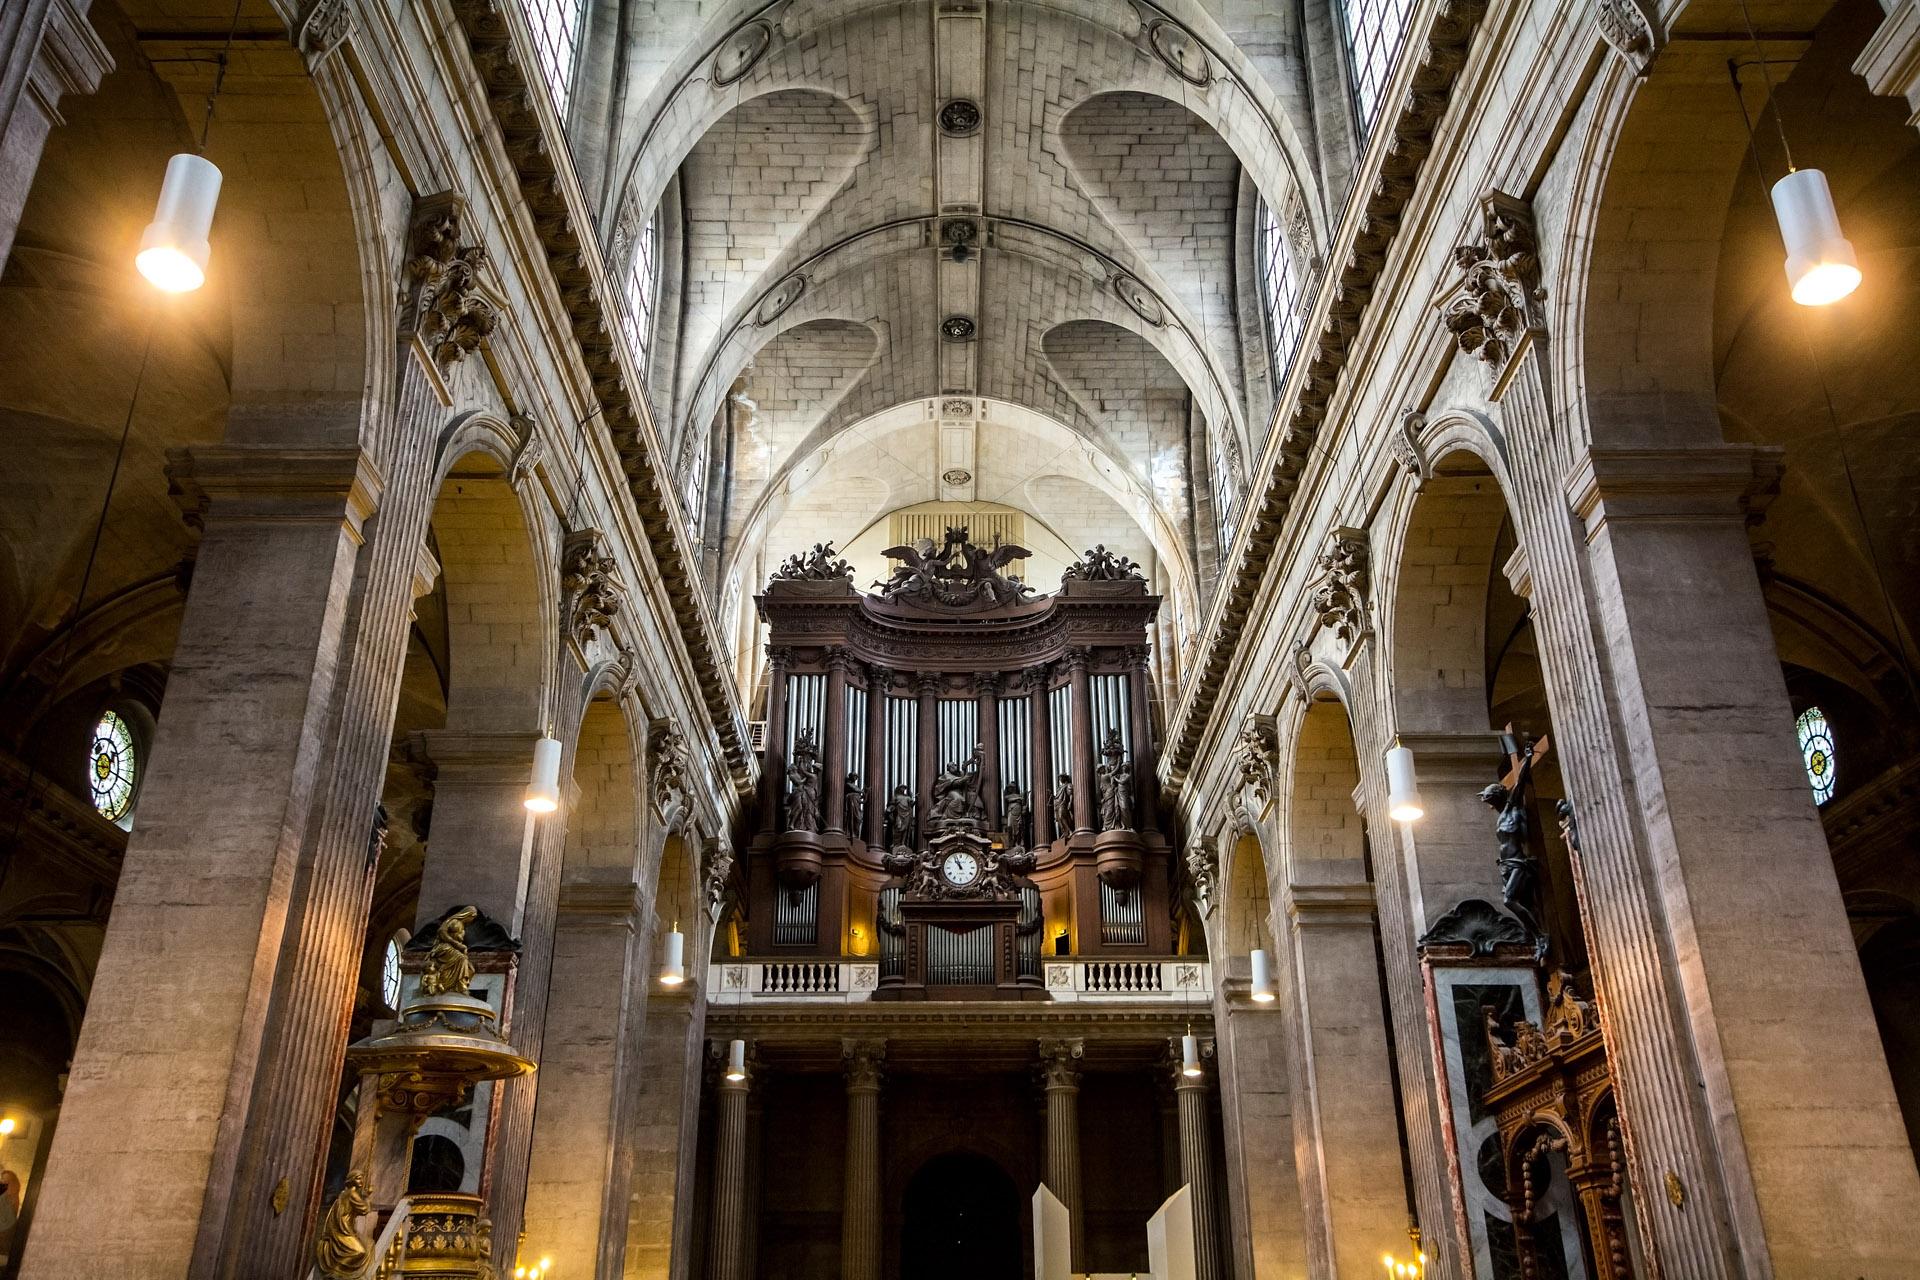 Church of Saint-Sulpice (interior)